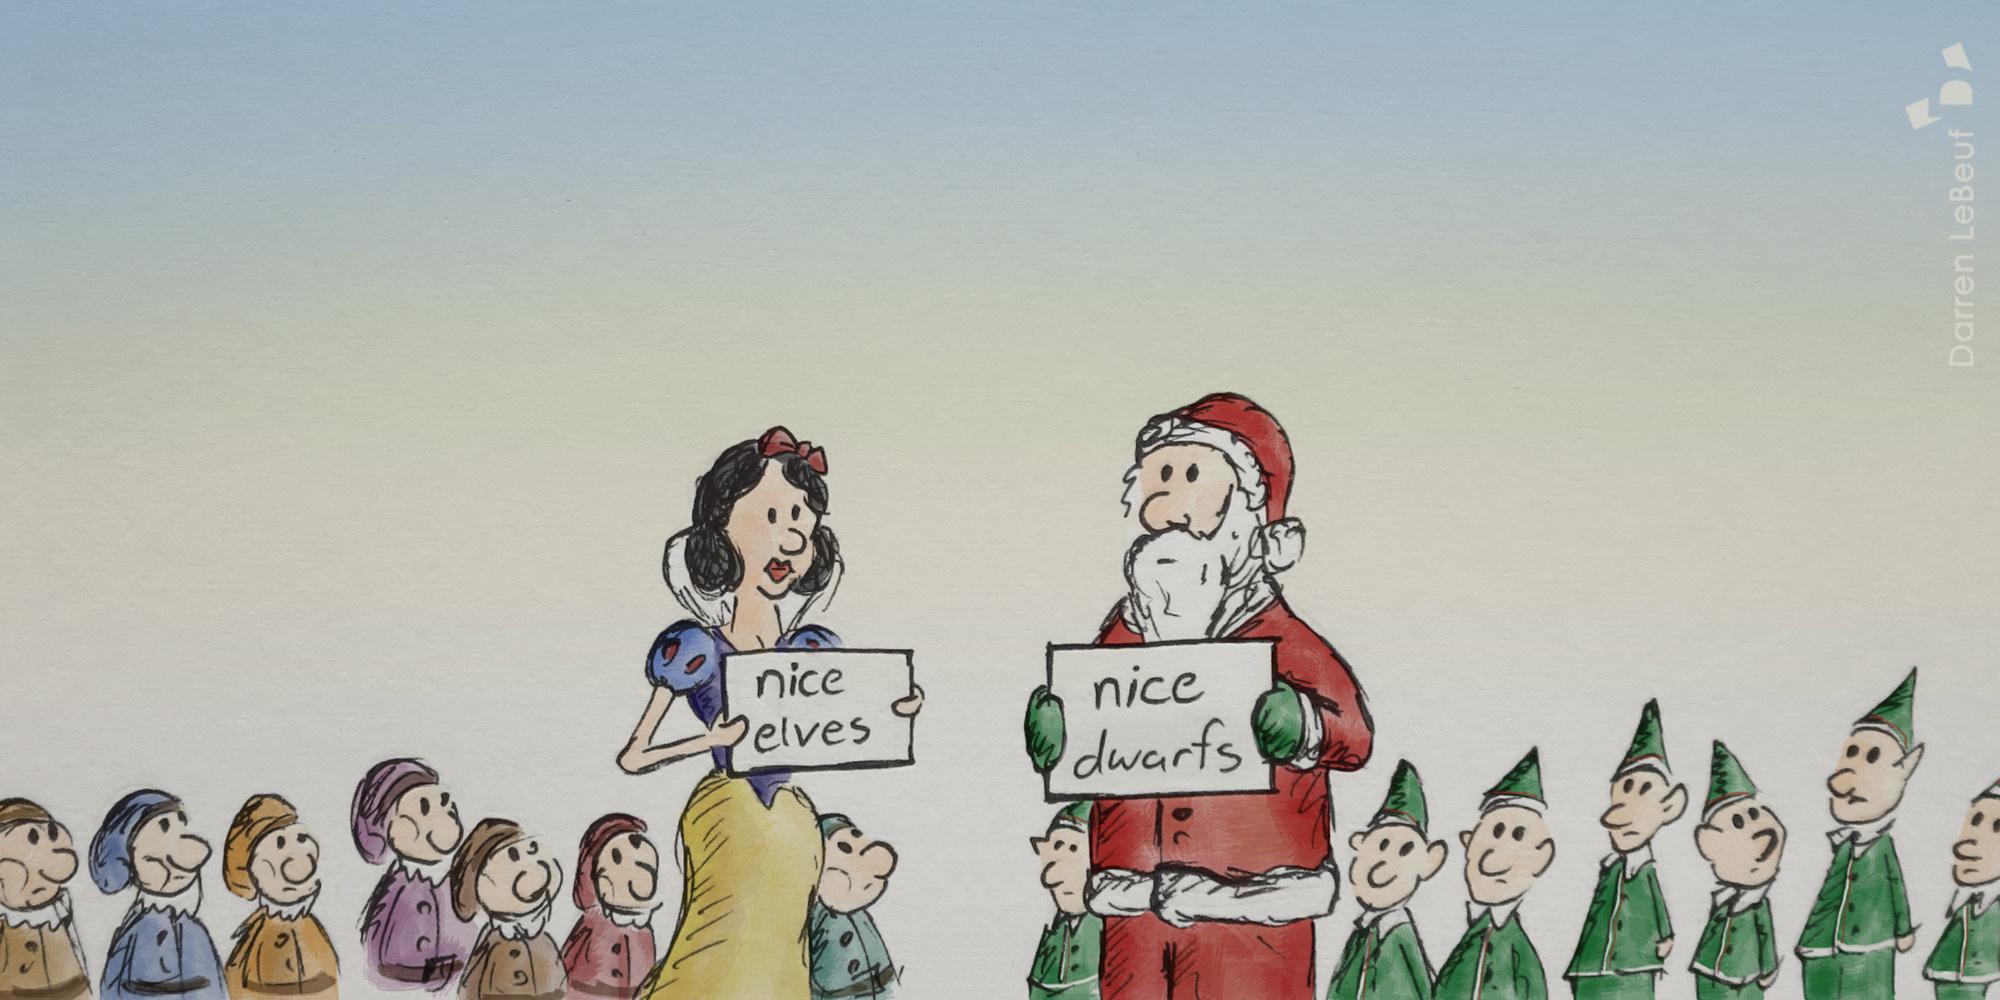 santa clause, elves, snow white, dwarfs, by Darren LeBeuf